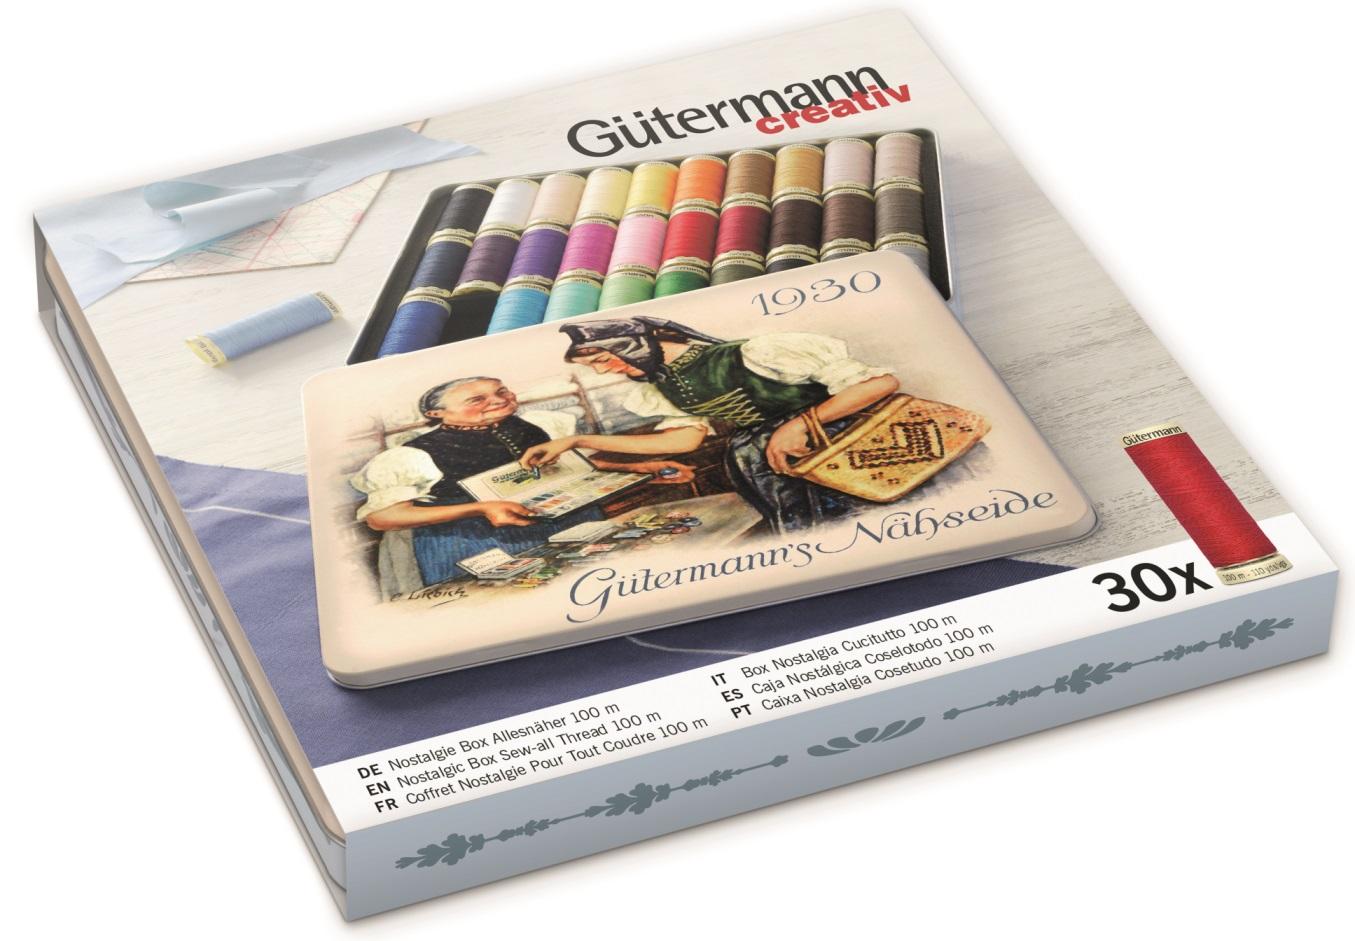 Gütermann 640953 Nostalgie-Box